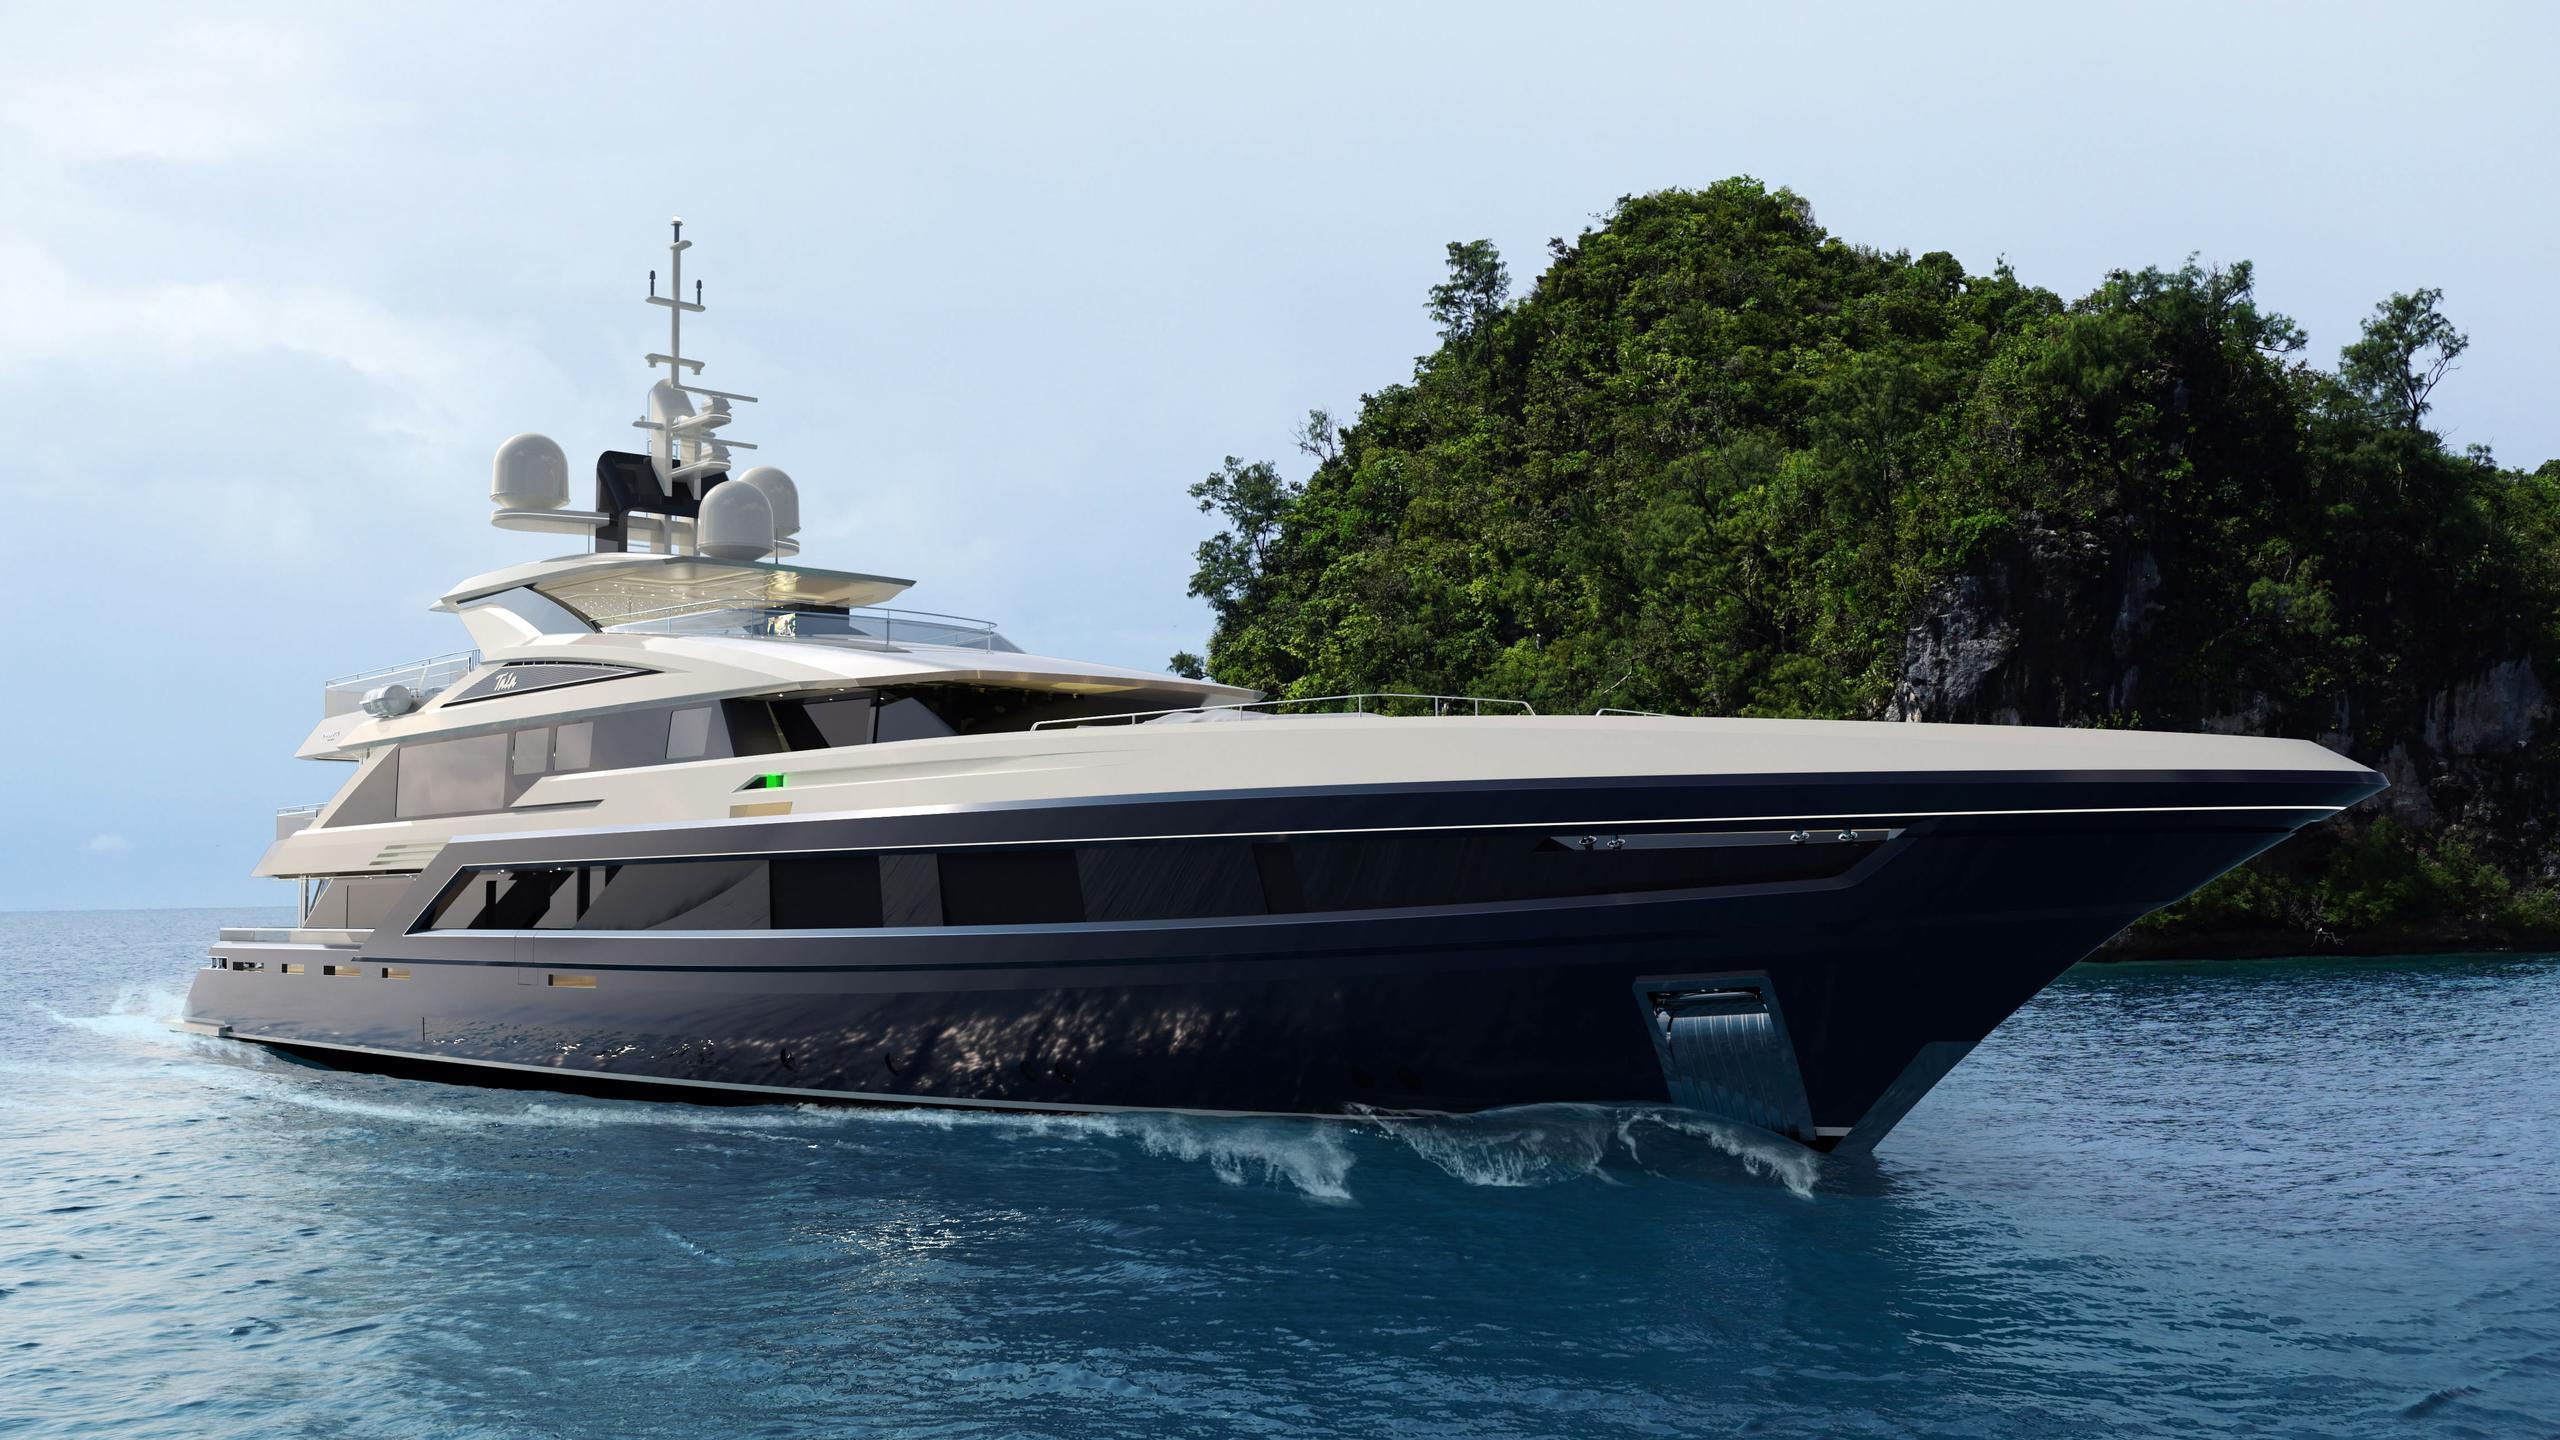 tala motoryacht turquoise yachts 53m 2020 rendering profile